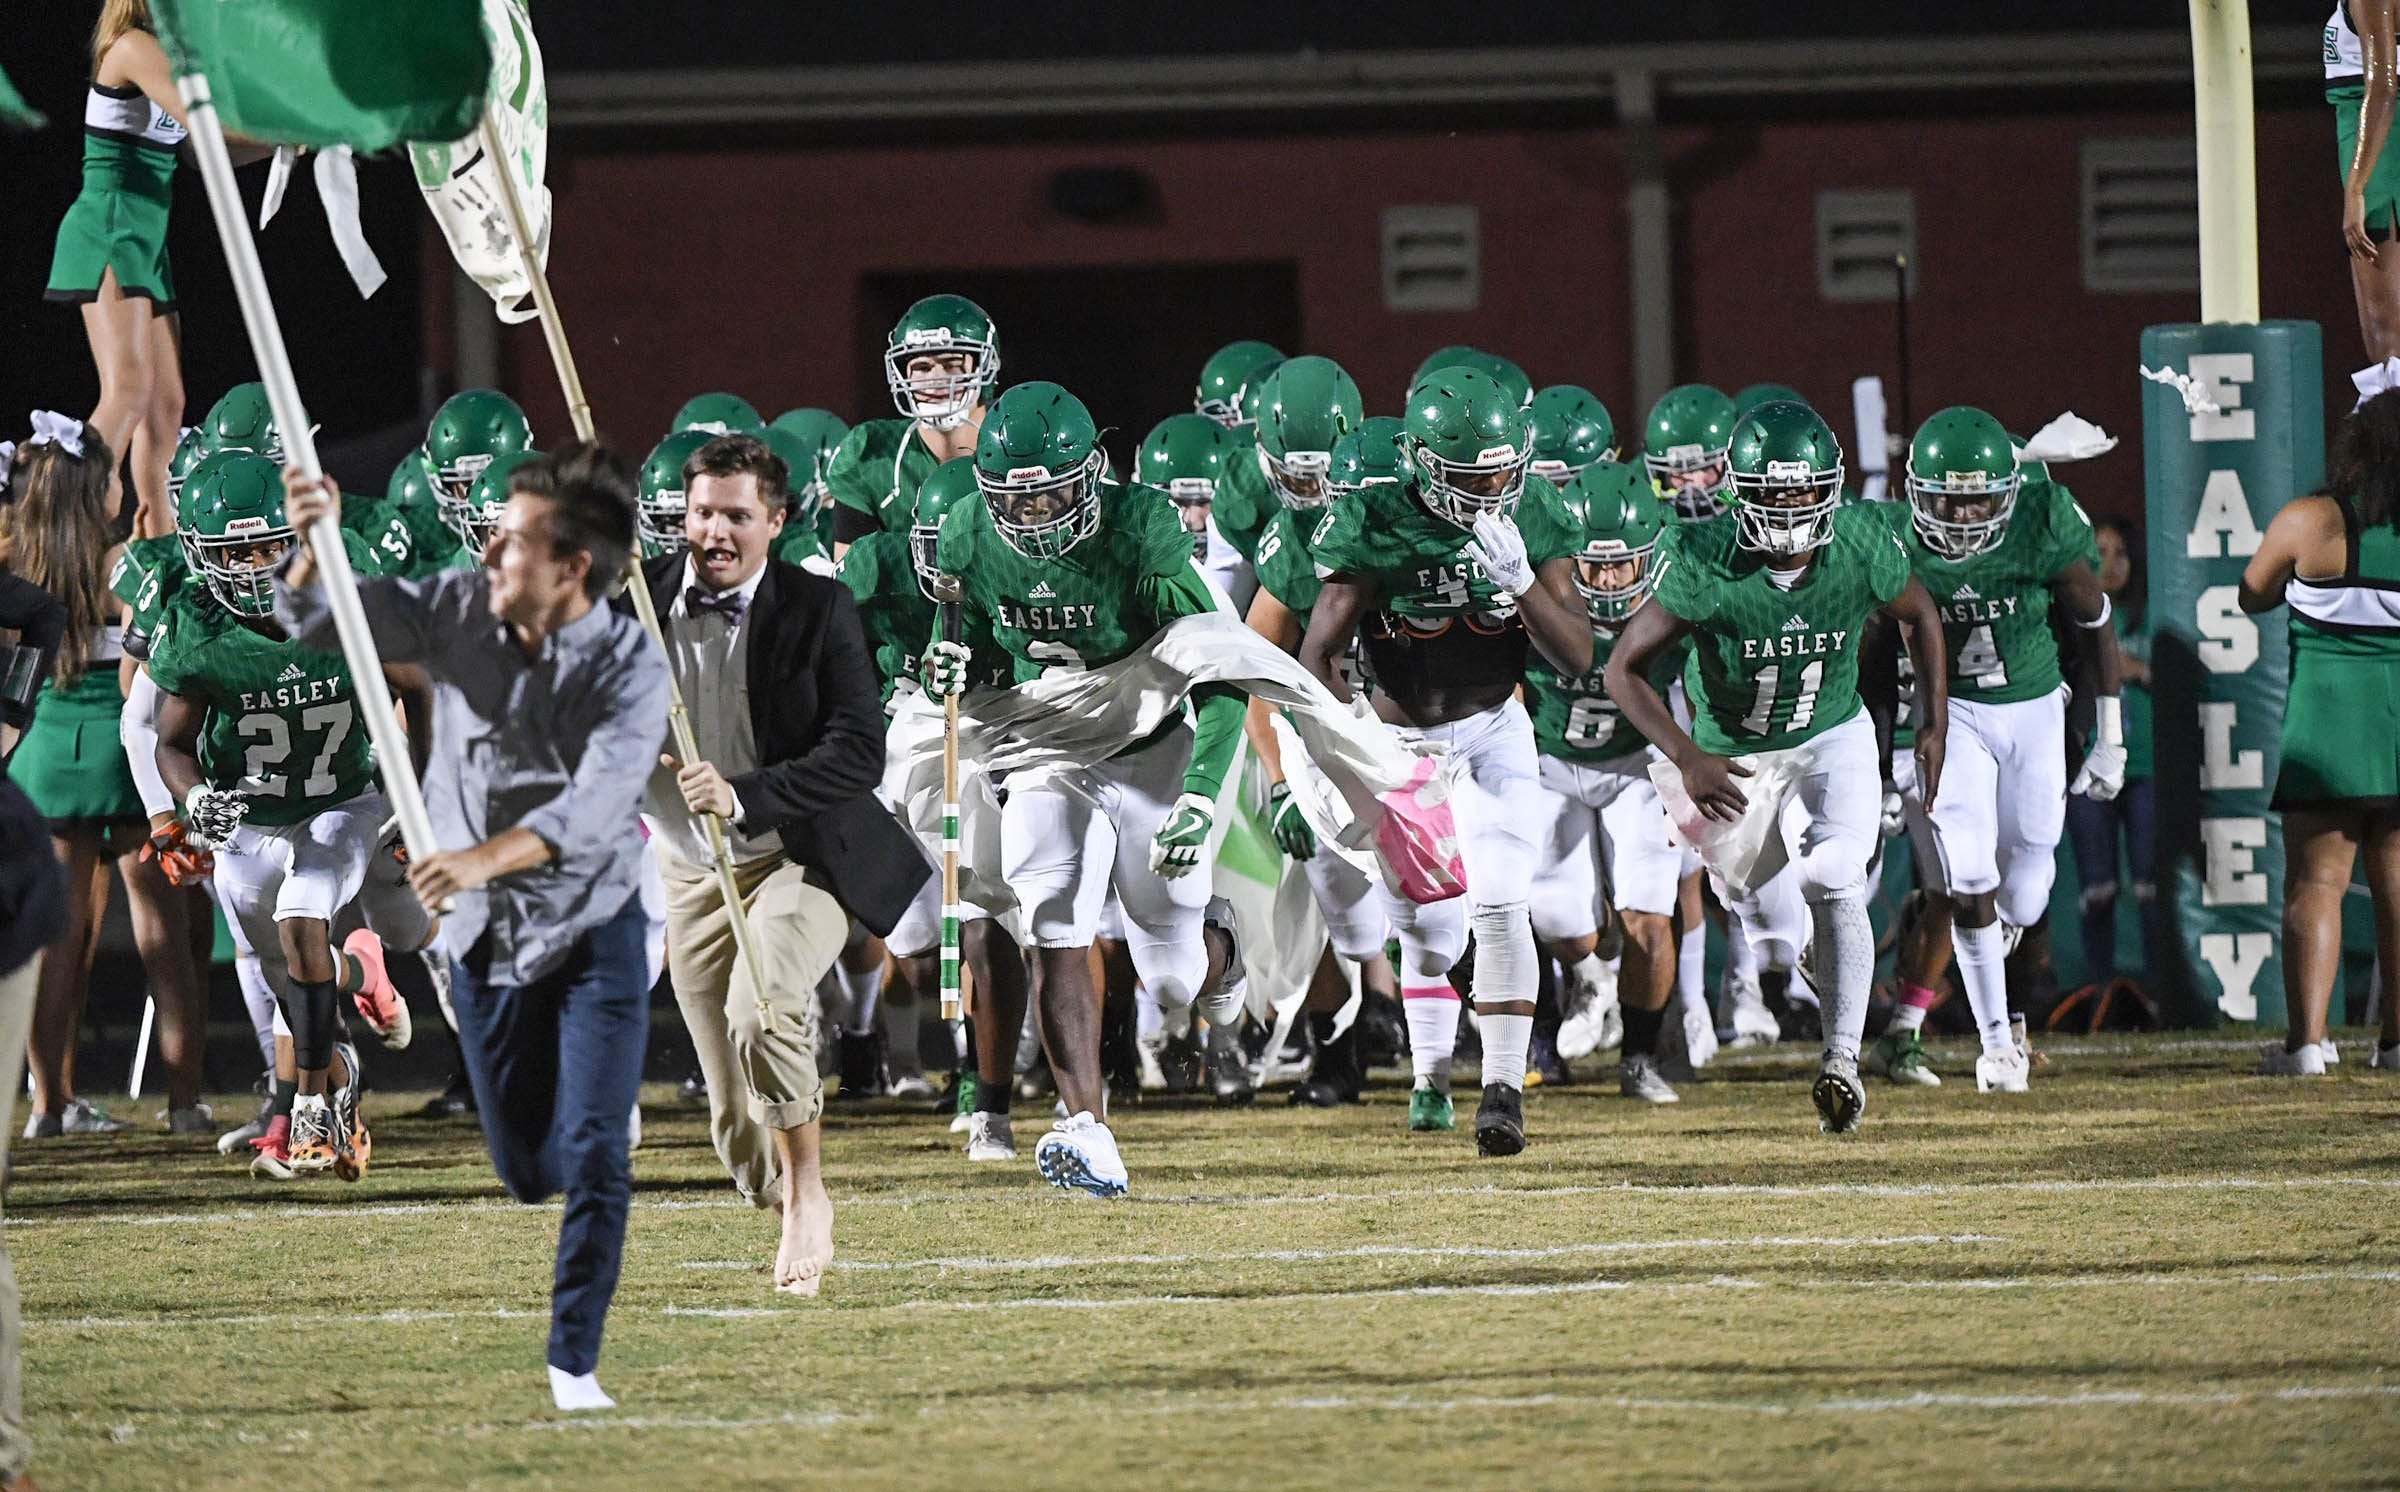 Easley High has a new football coach